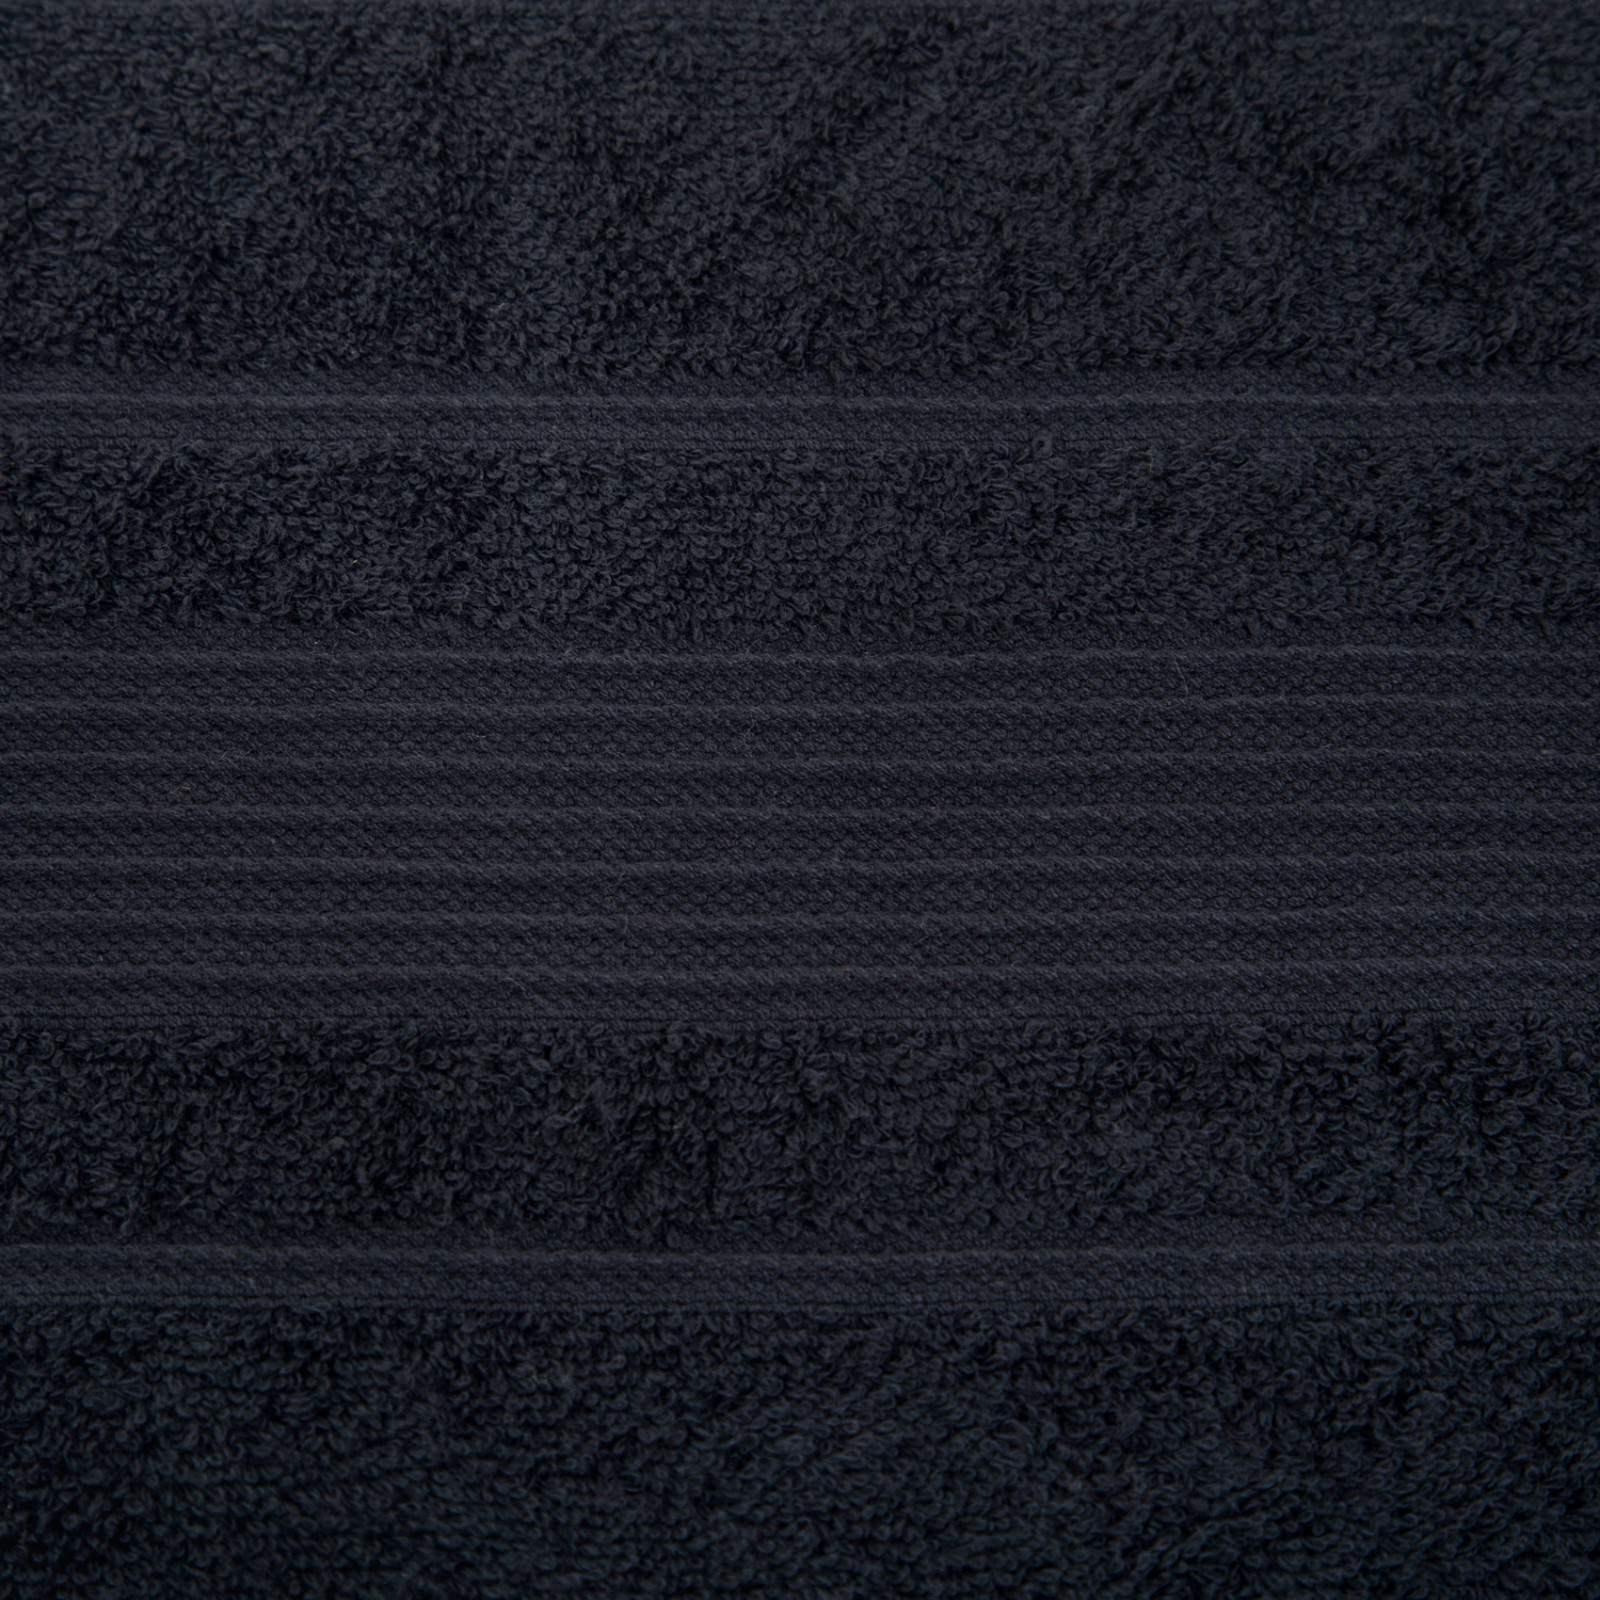 NEW BLACK Color SUPER LUXURY PURE TURKISH 100% COTTON TOWELS